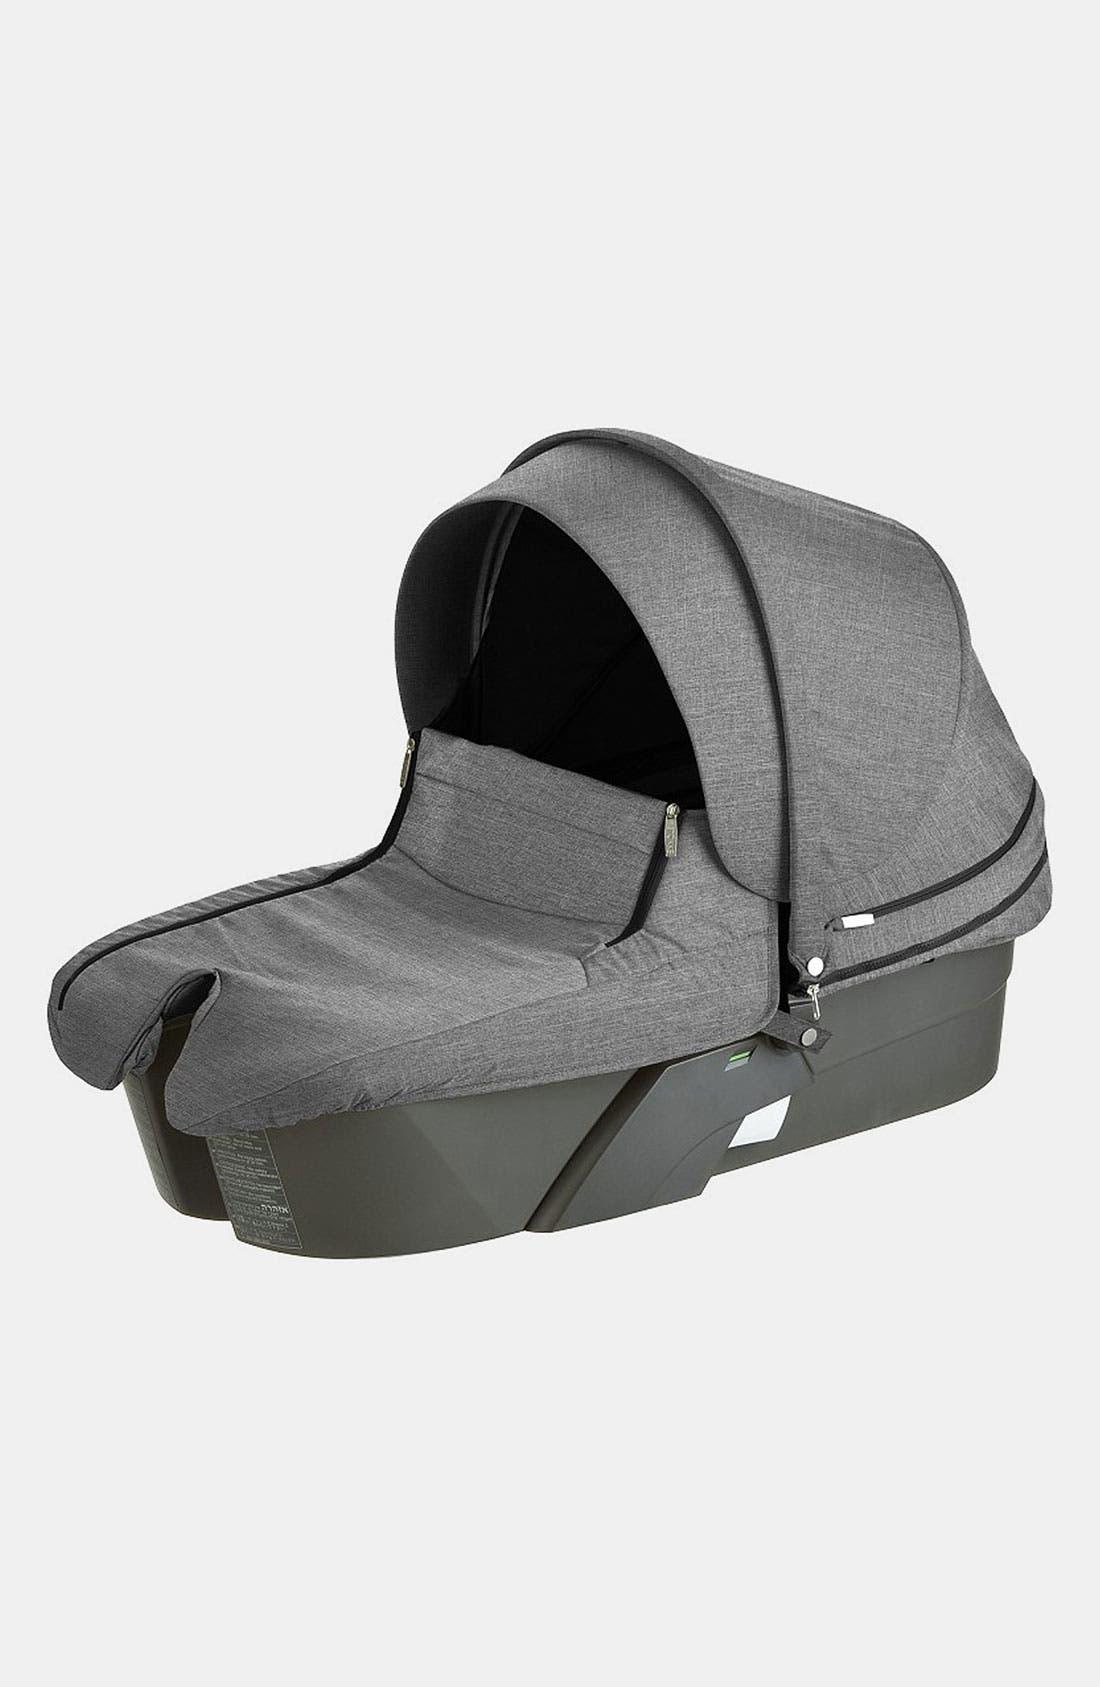 Alternate Image 1 Selected - Stokke 'Xplory®' Stroller Carry Cot